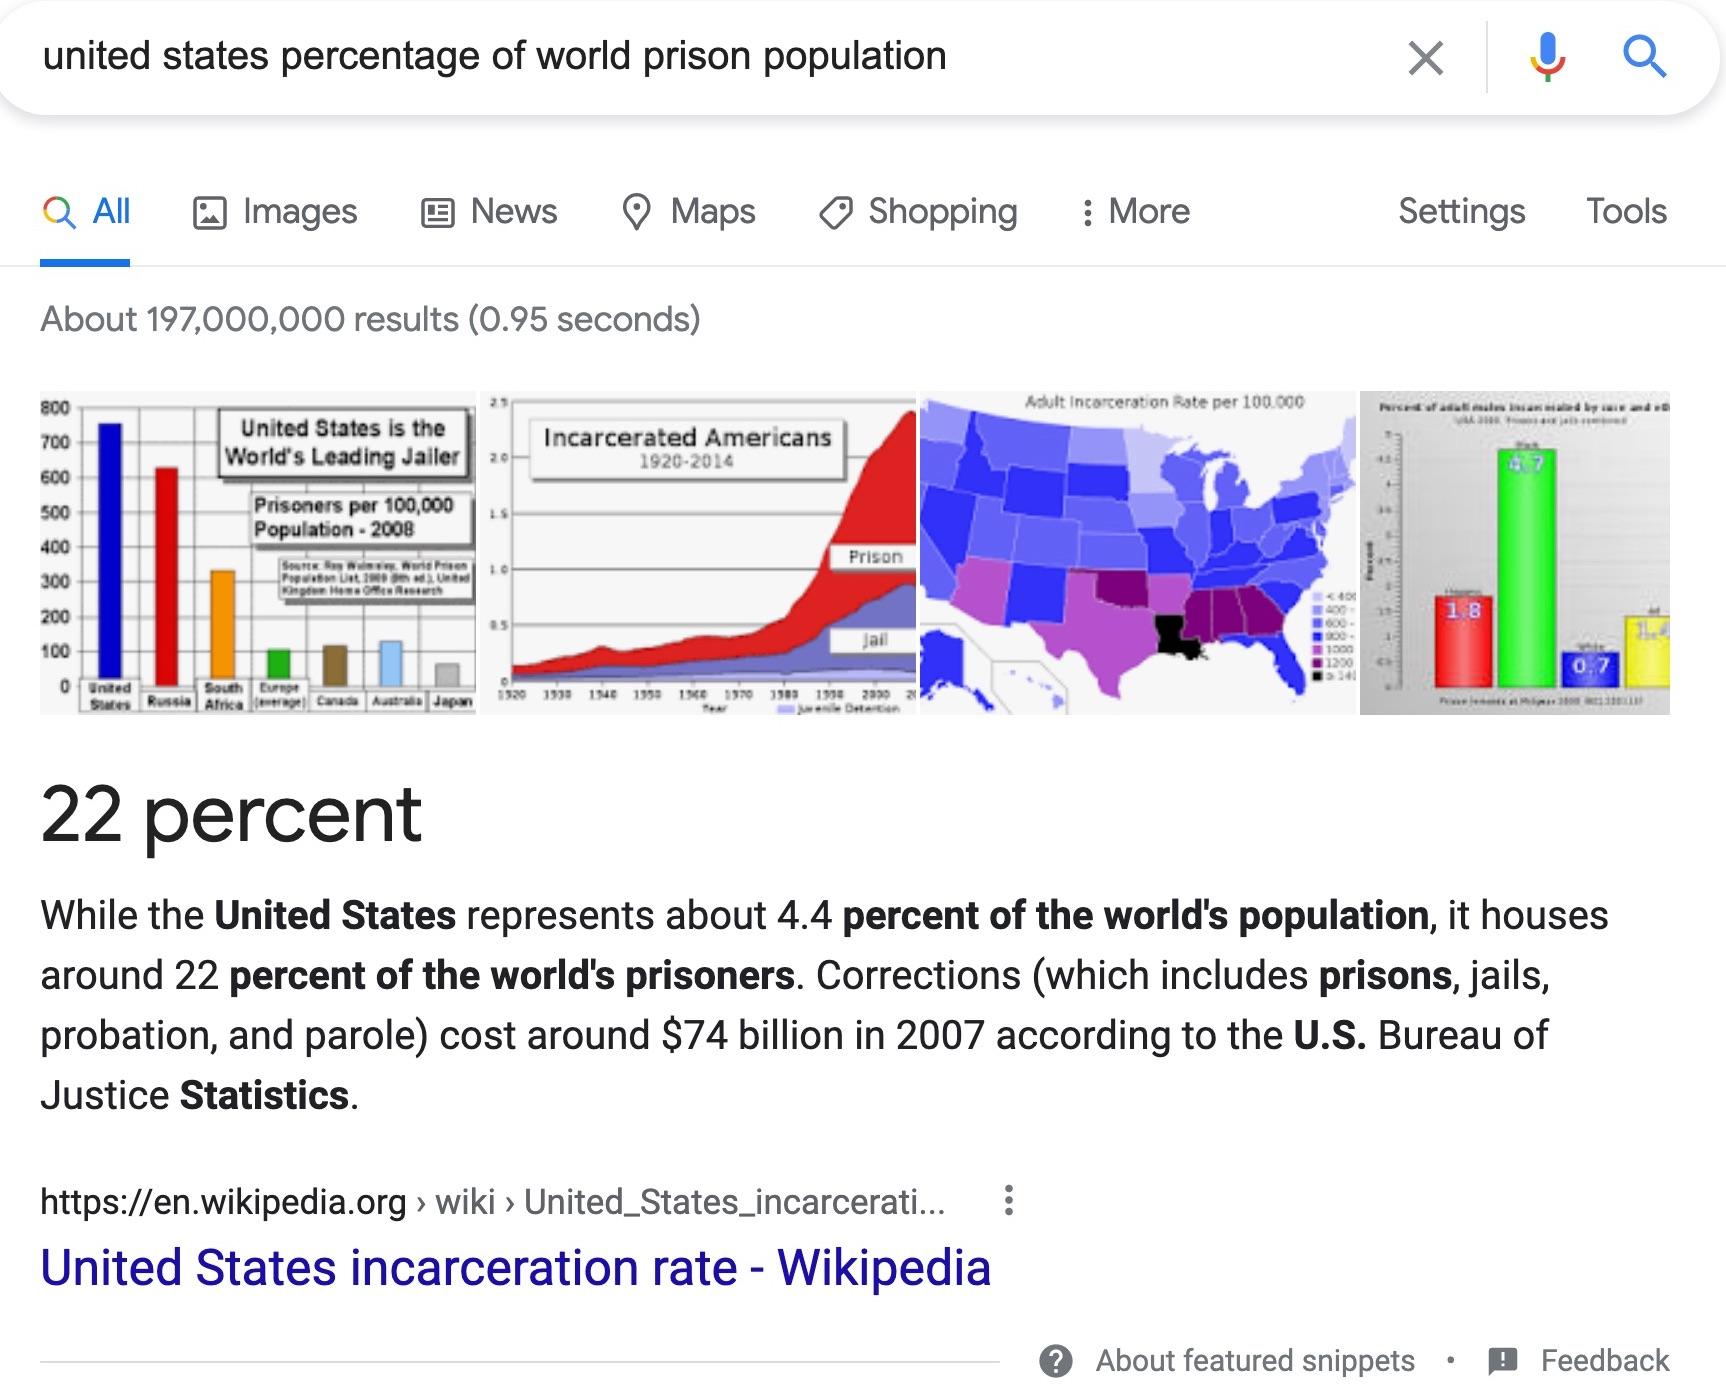 united states percentage of prison population 2021